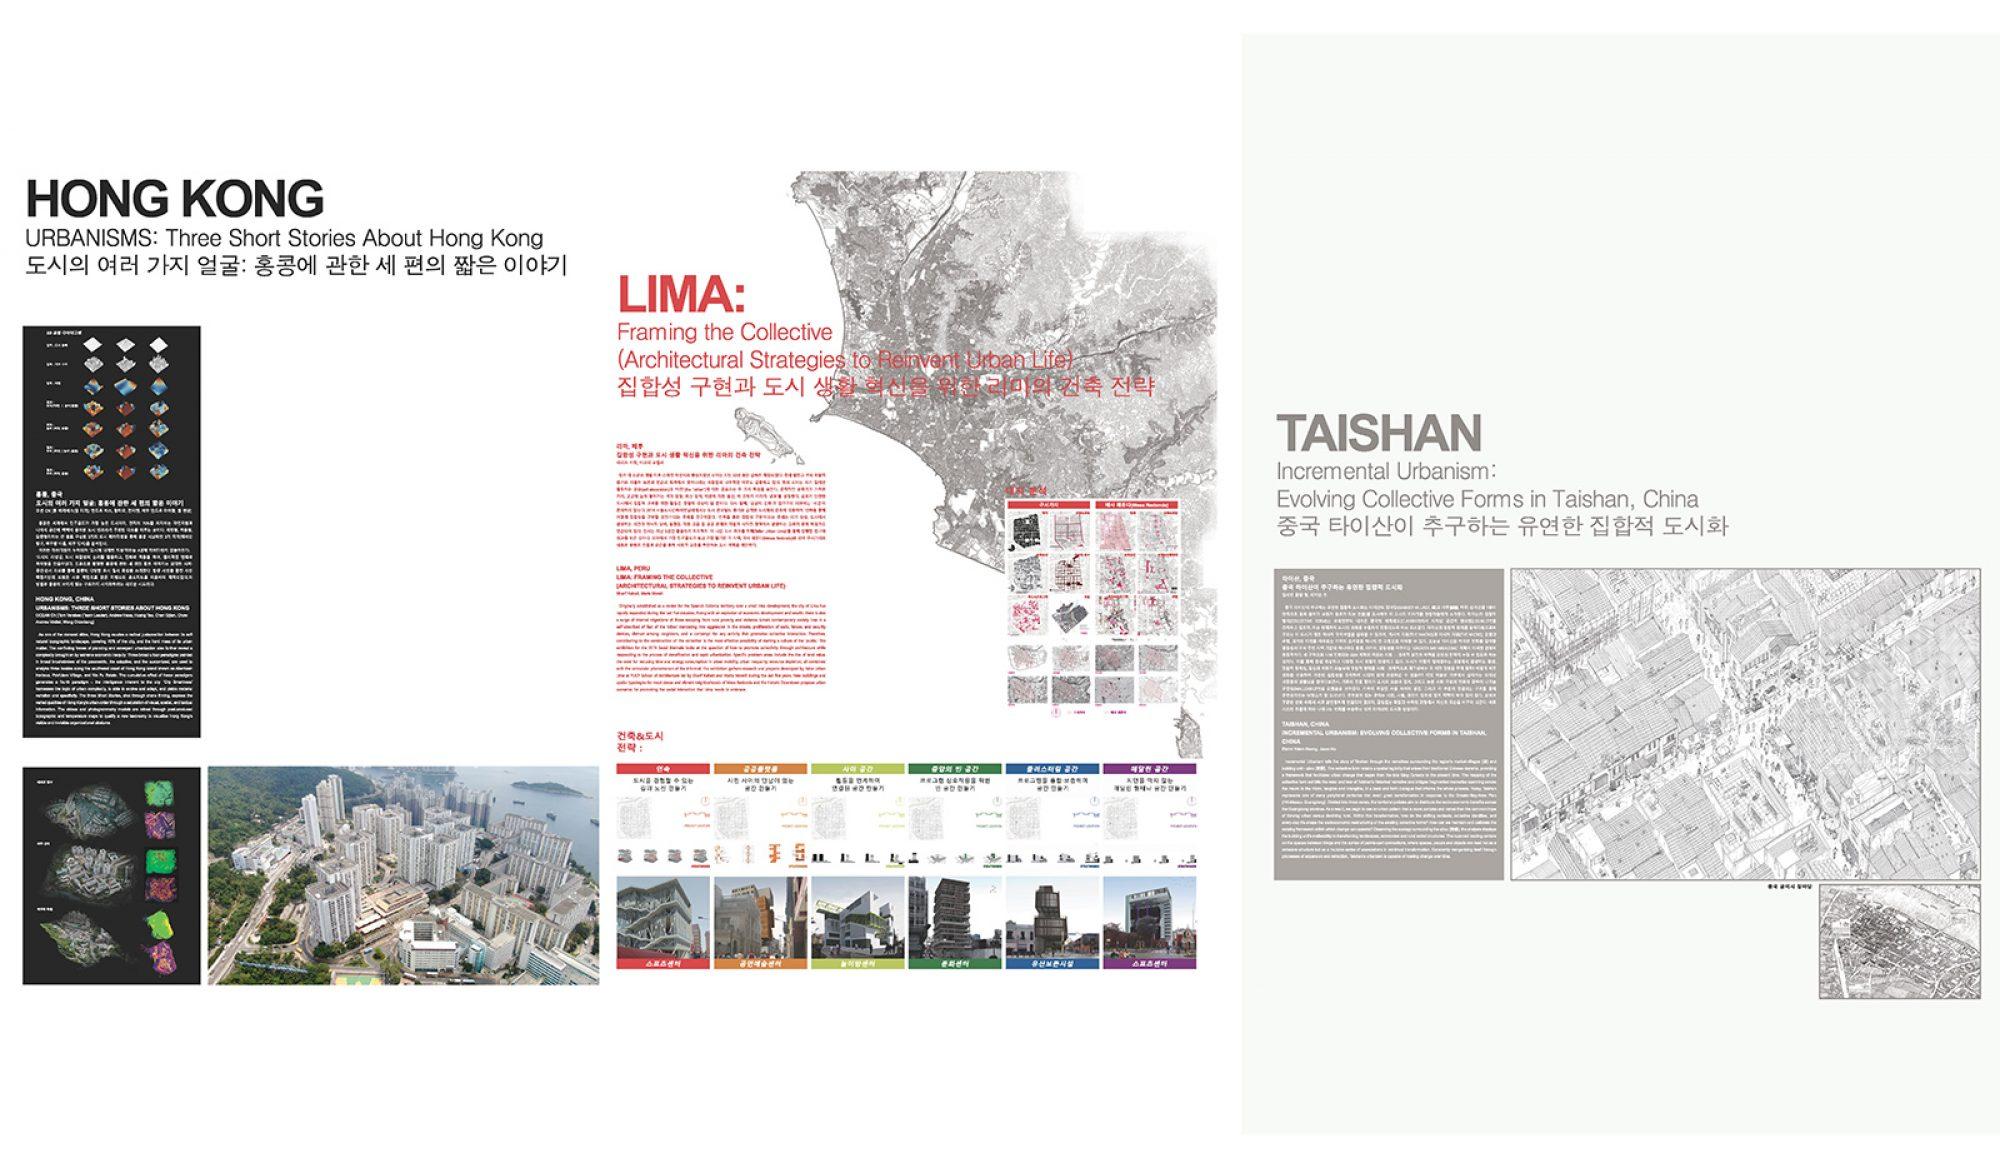 12 A_G4_Regenerating_HK_Lima_Taishan (custom)